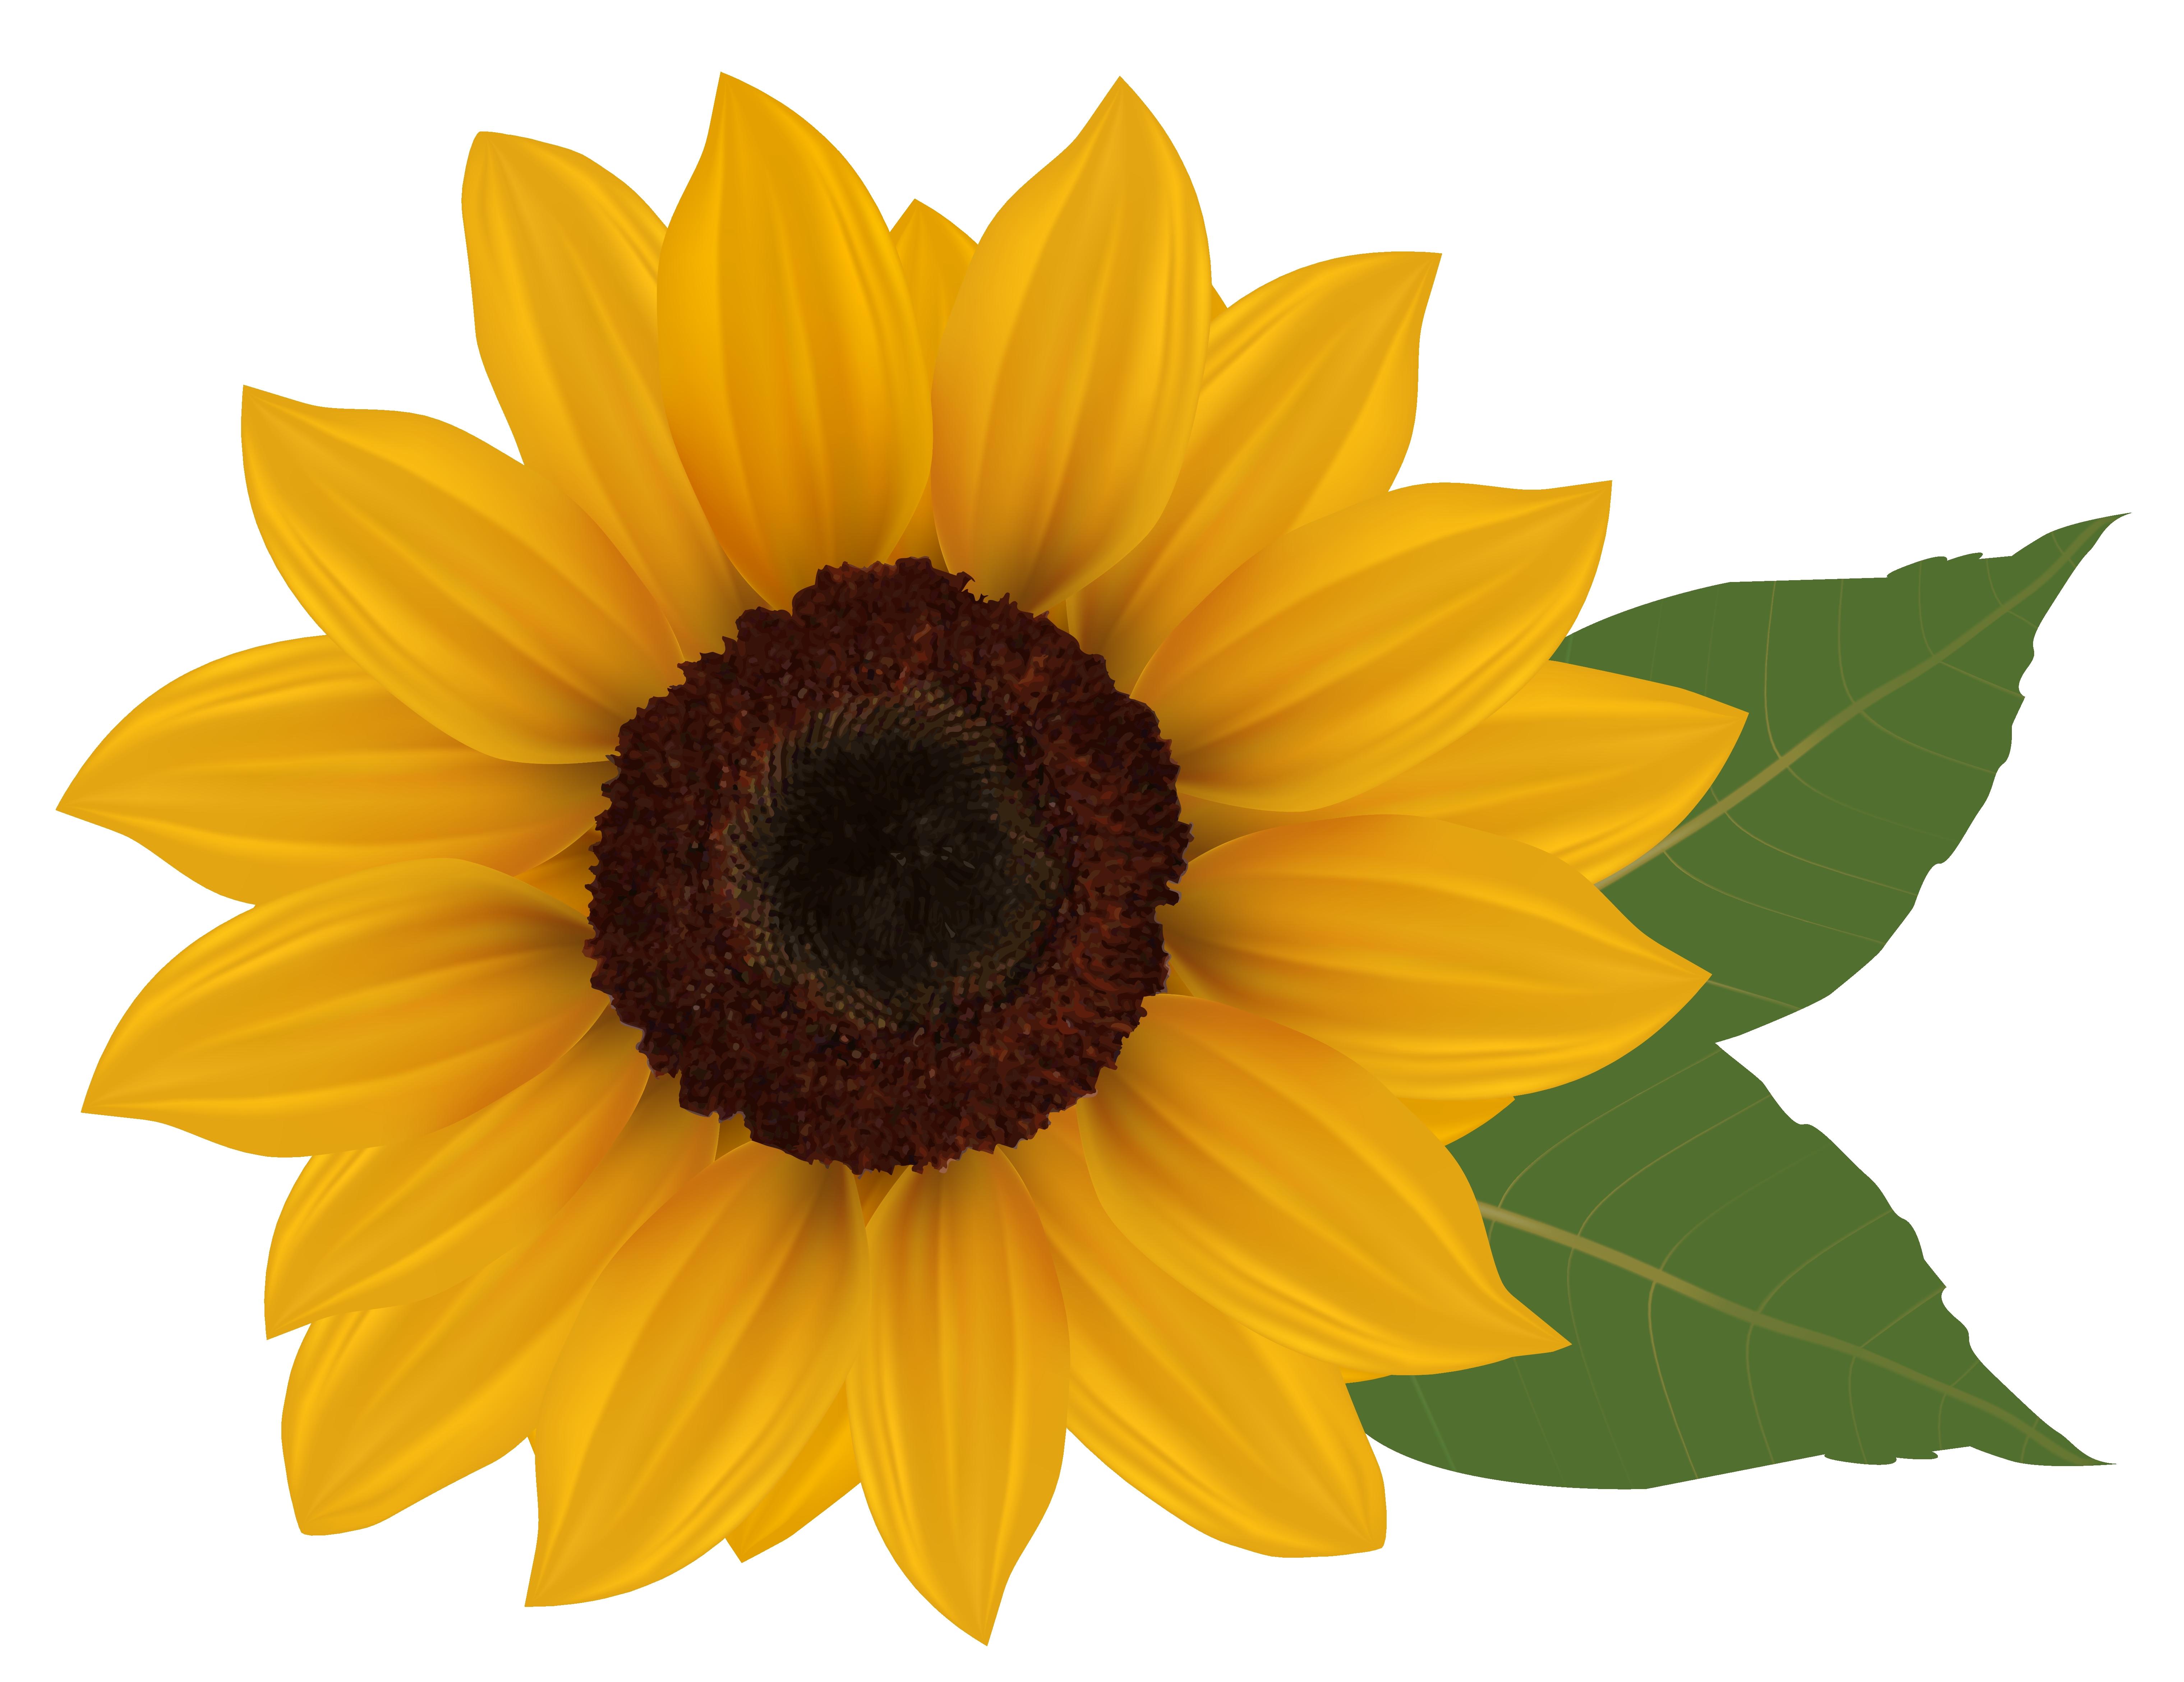 3 clipart sunflower. New design digital collection